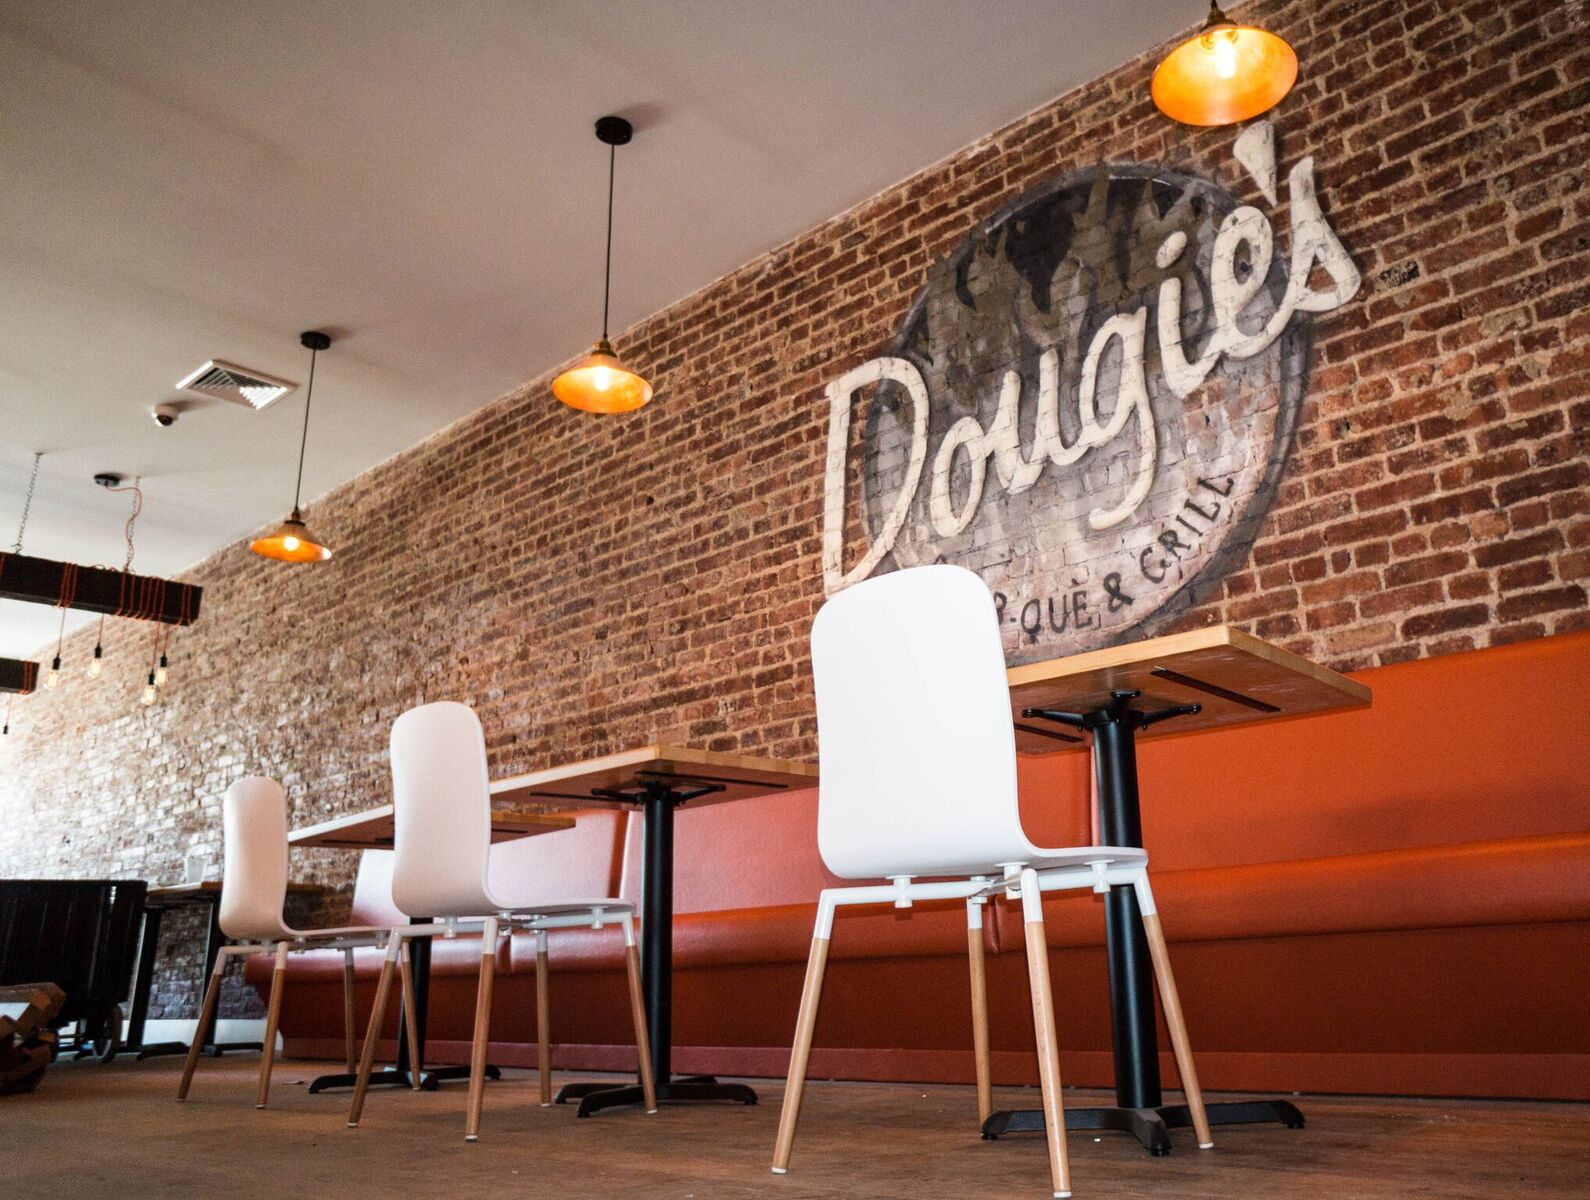 Dougies BBQ on Ave. J Set to Open - GREAT KOSHER RESTAURANTS